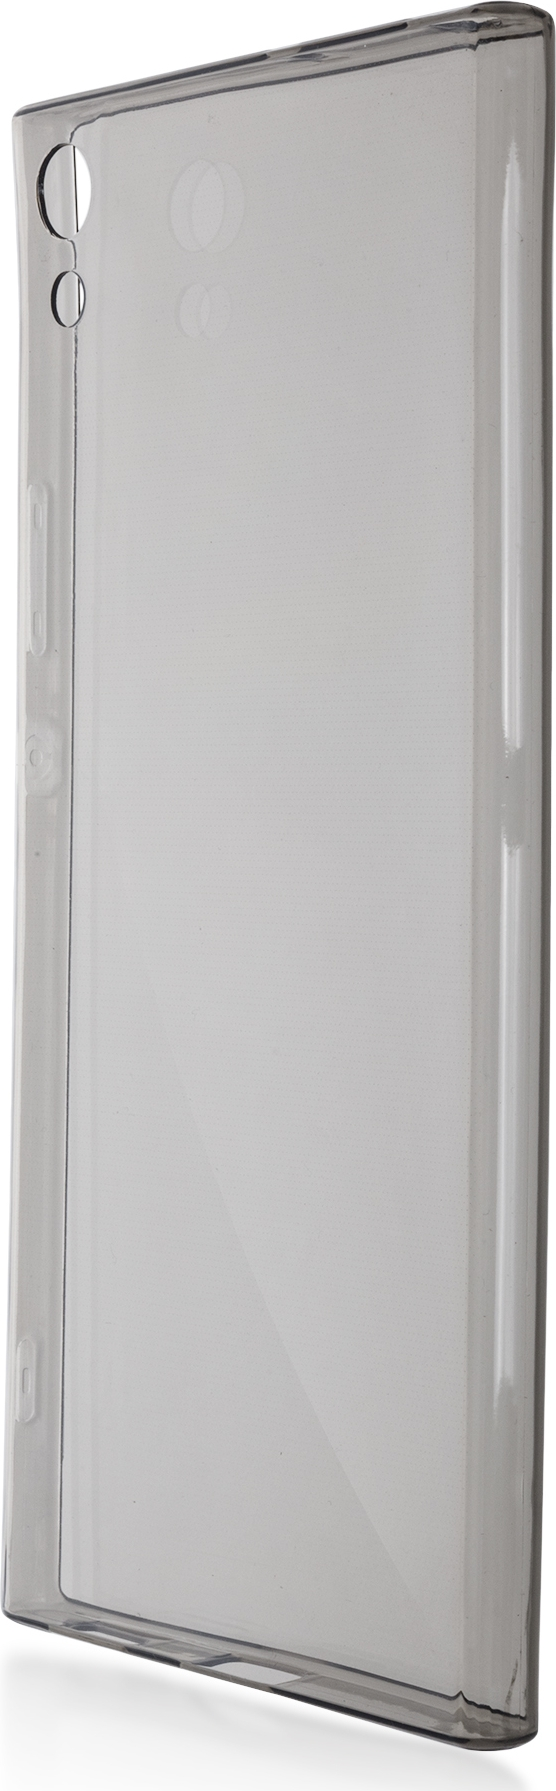 Чехол Brosco TPU для Sony Xperia XA1 Ultra, черный смартфон sony xperia xa1 ultra dual 32 гб белый g3212white